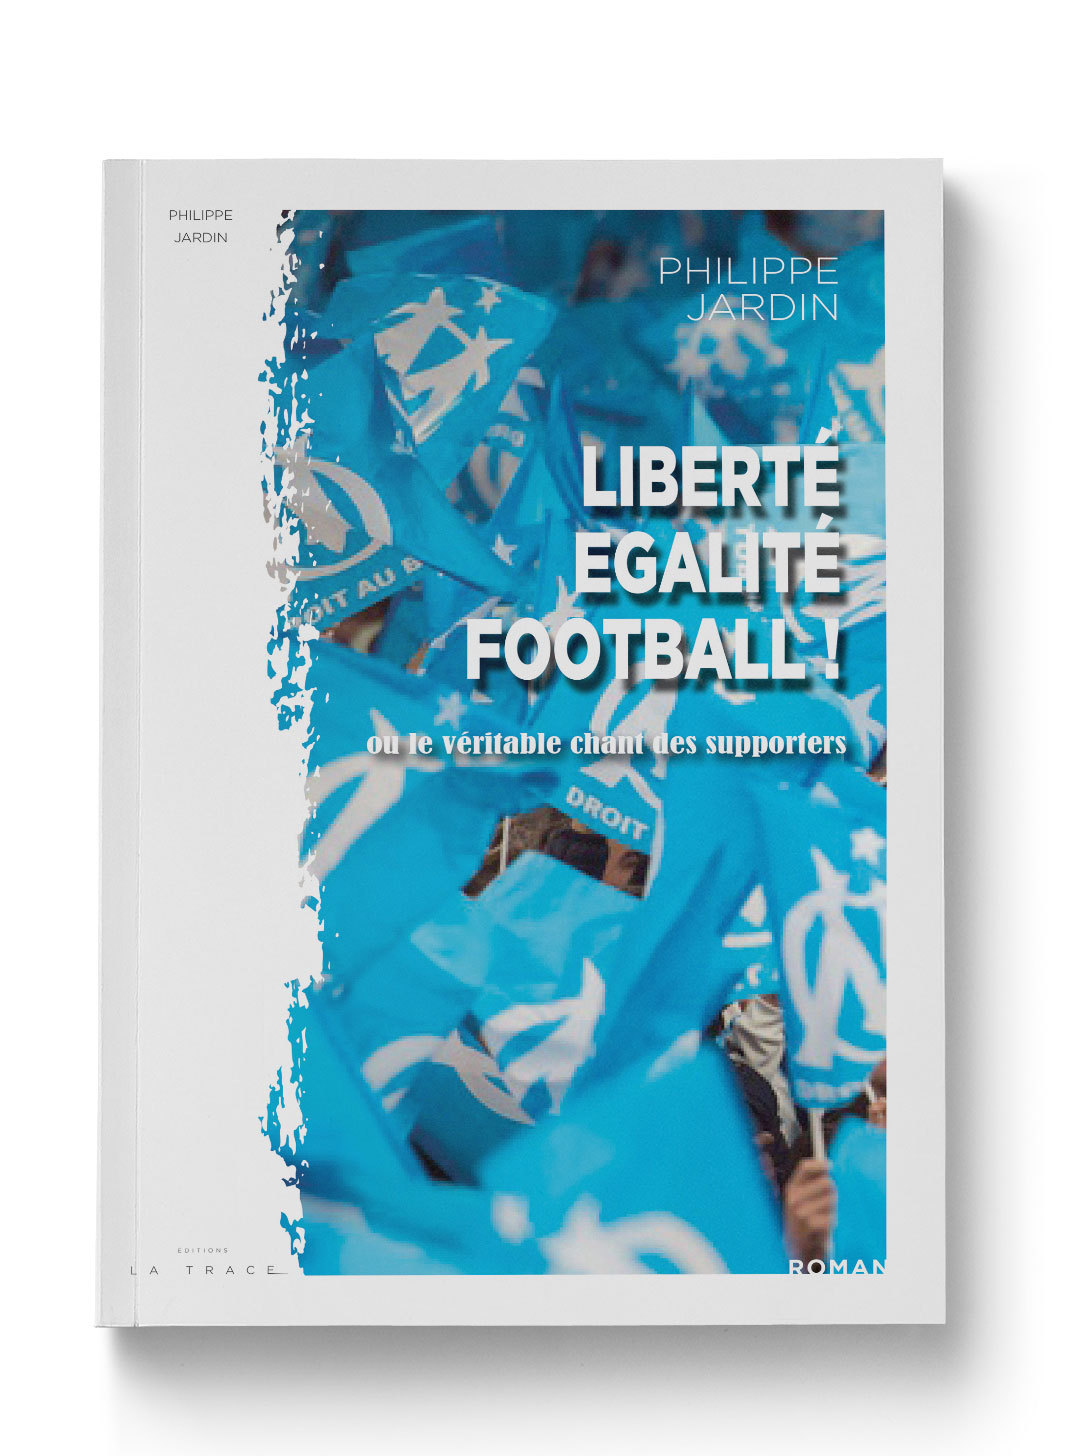 LIBERTE, EGALITE, FOOTBALL !